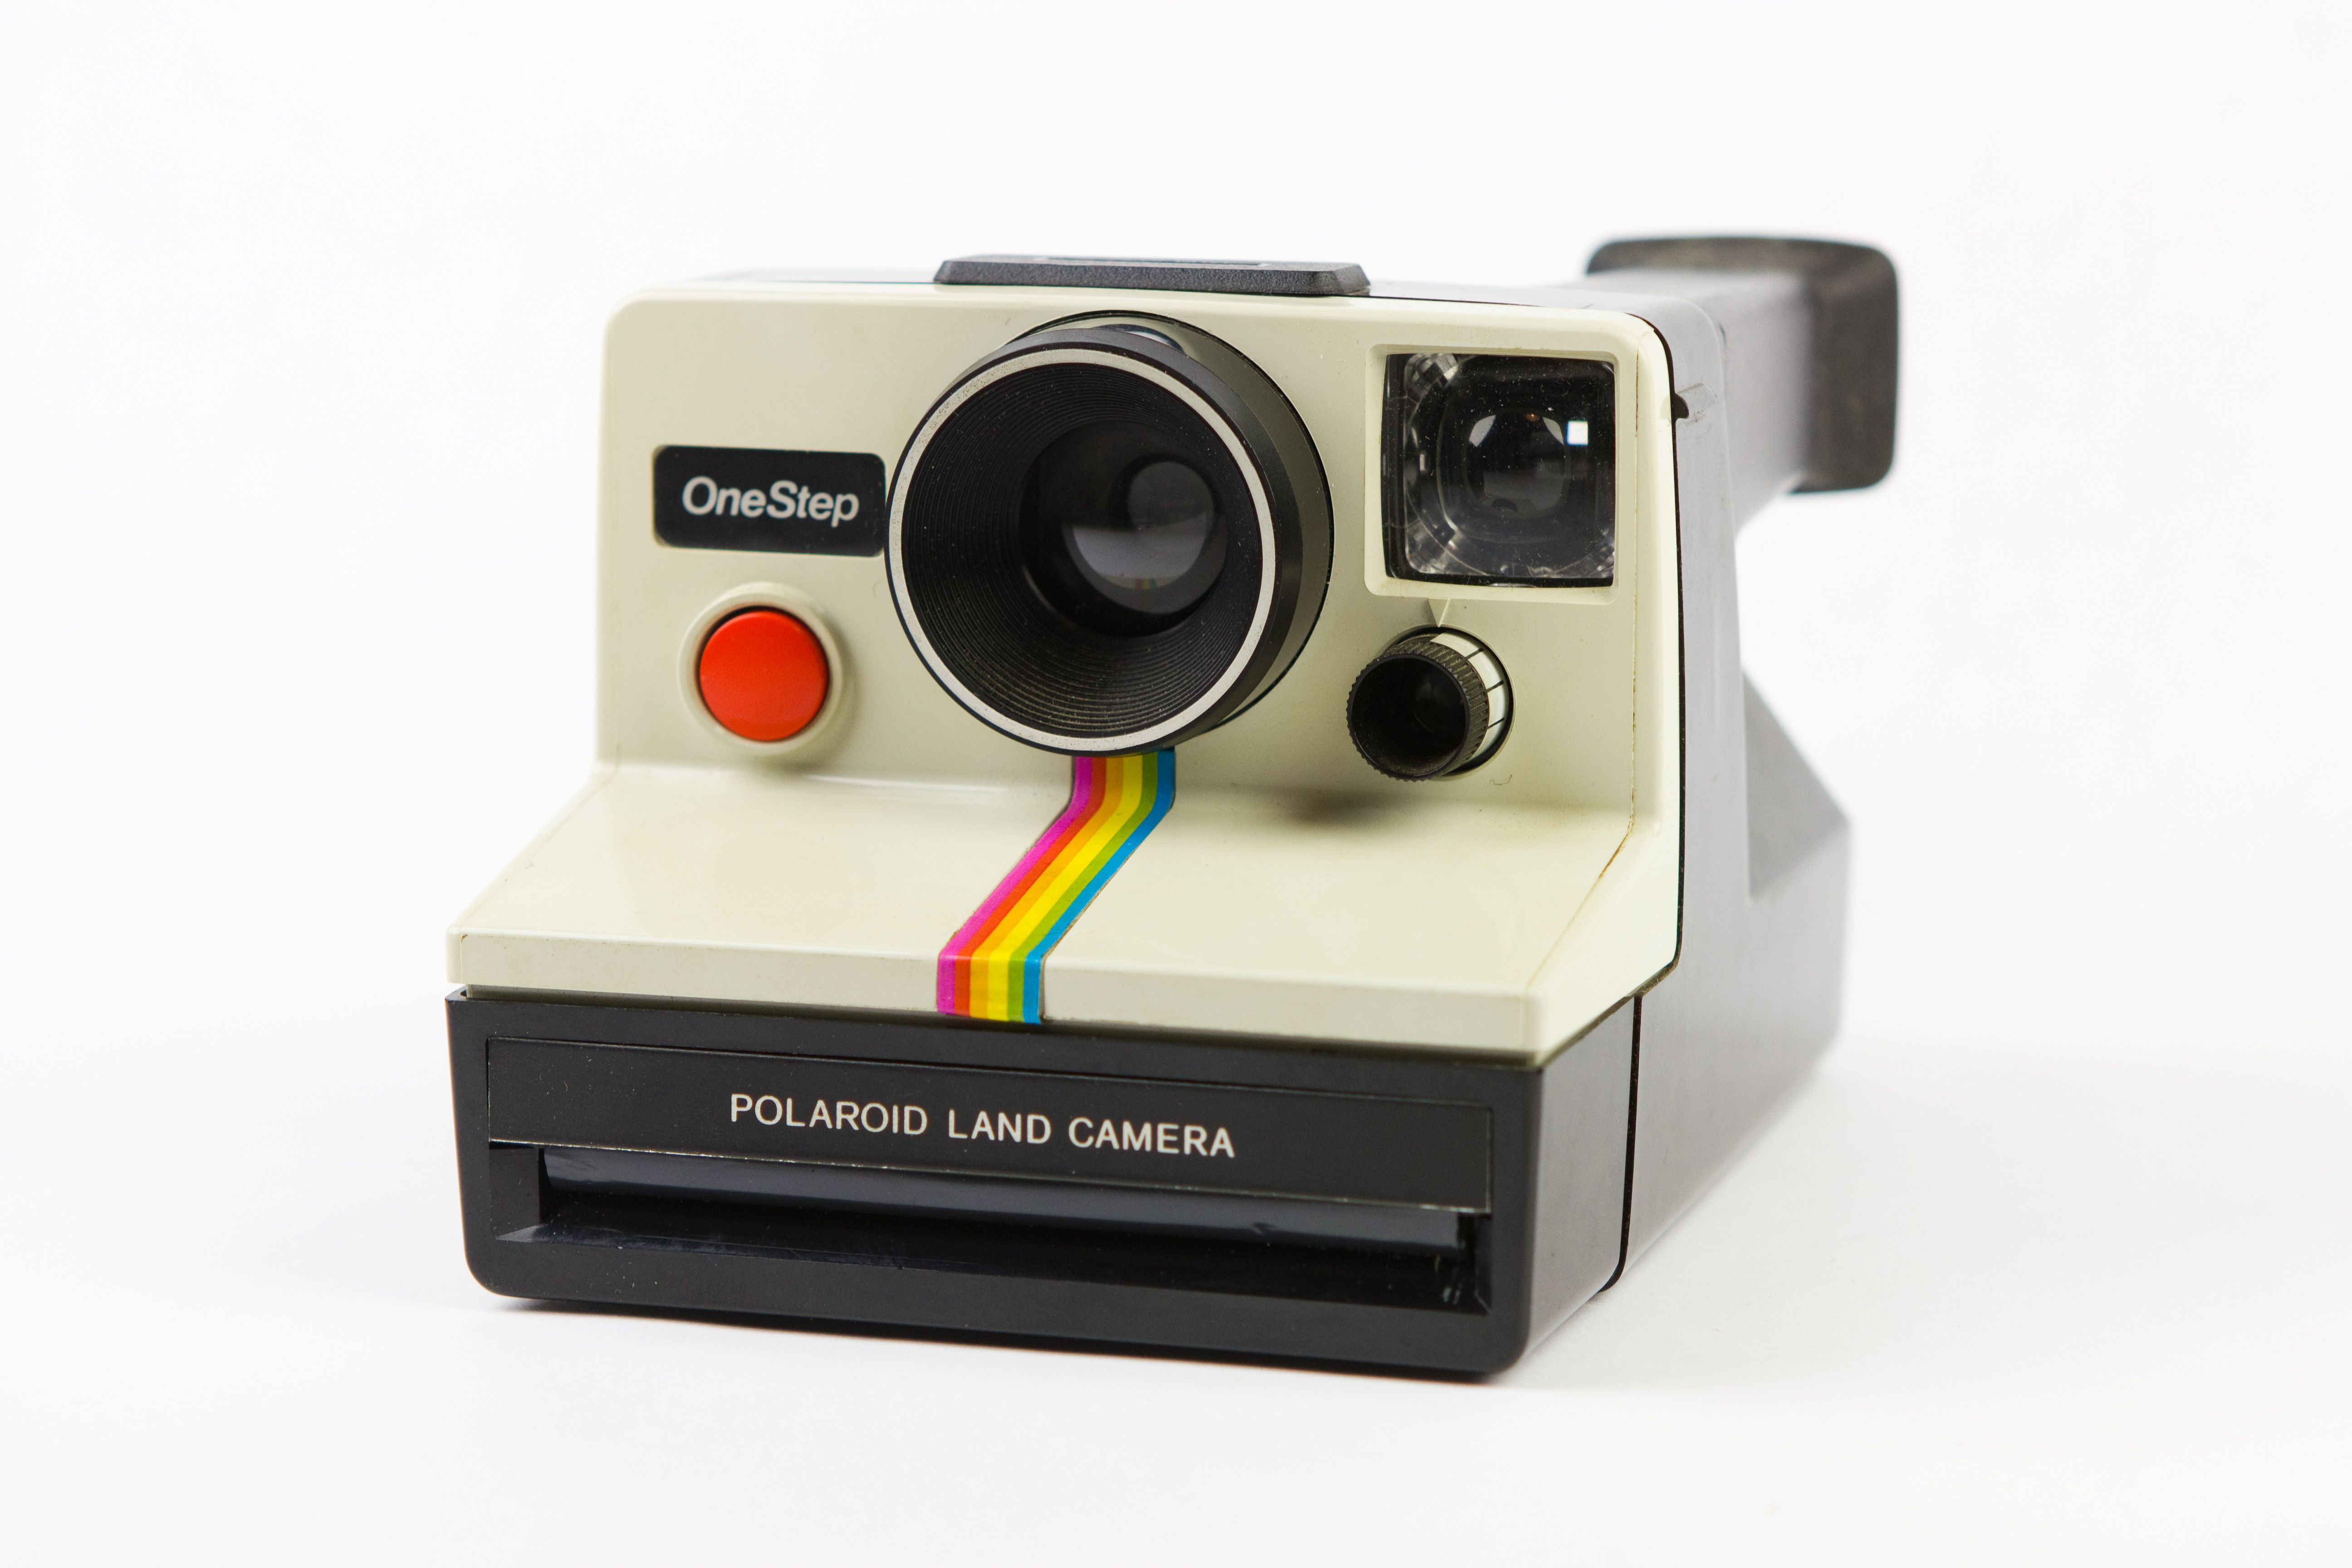 polaroid camera - Google Search   object assignment   Pinterest ...